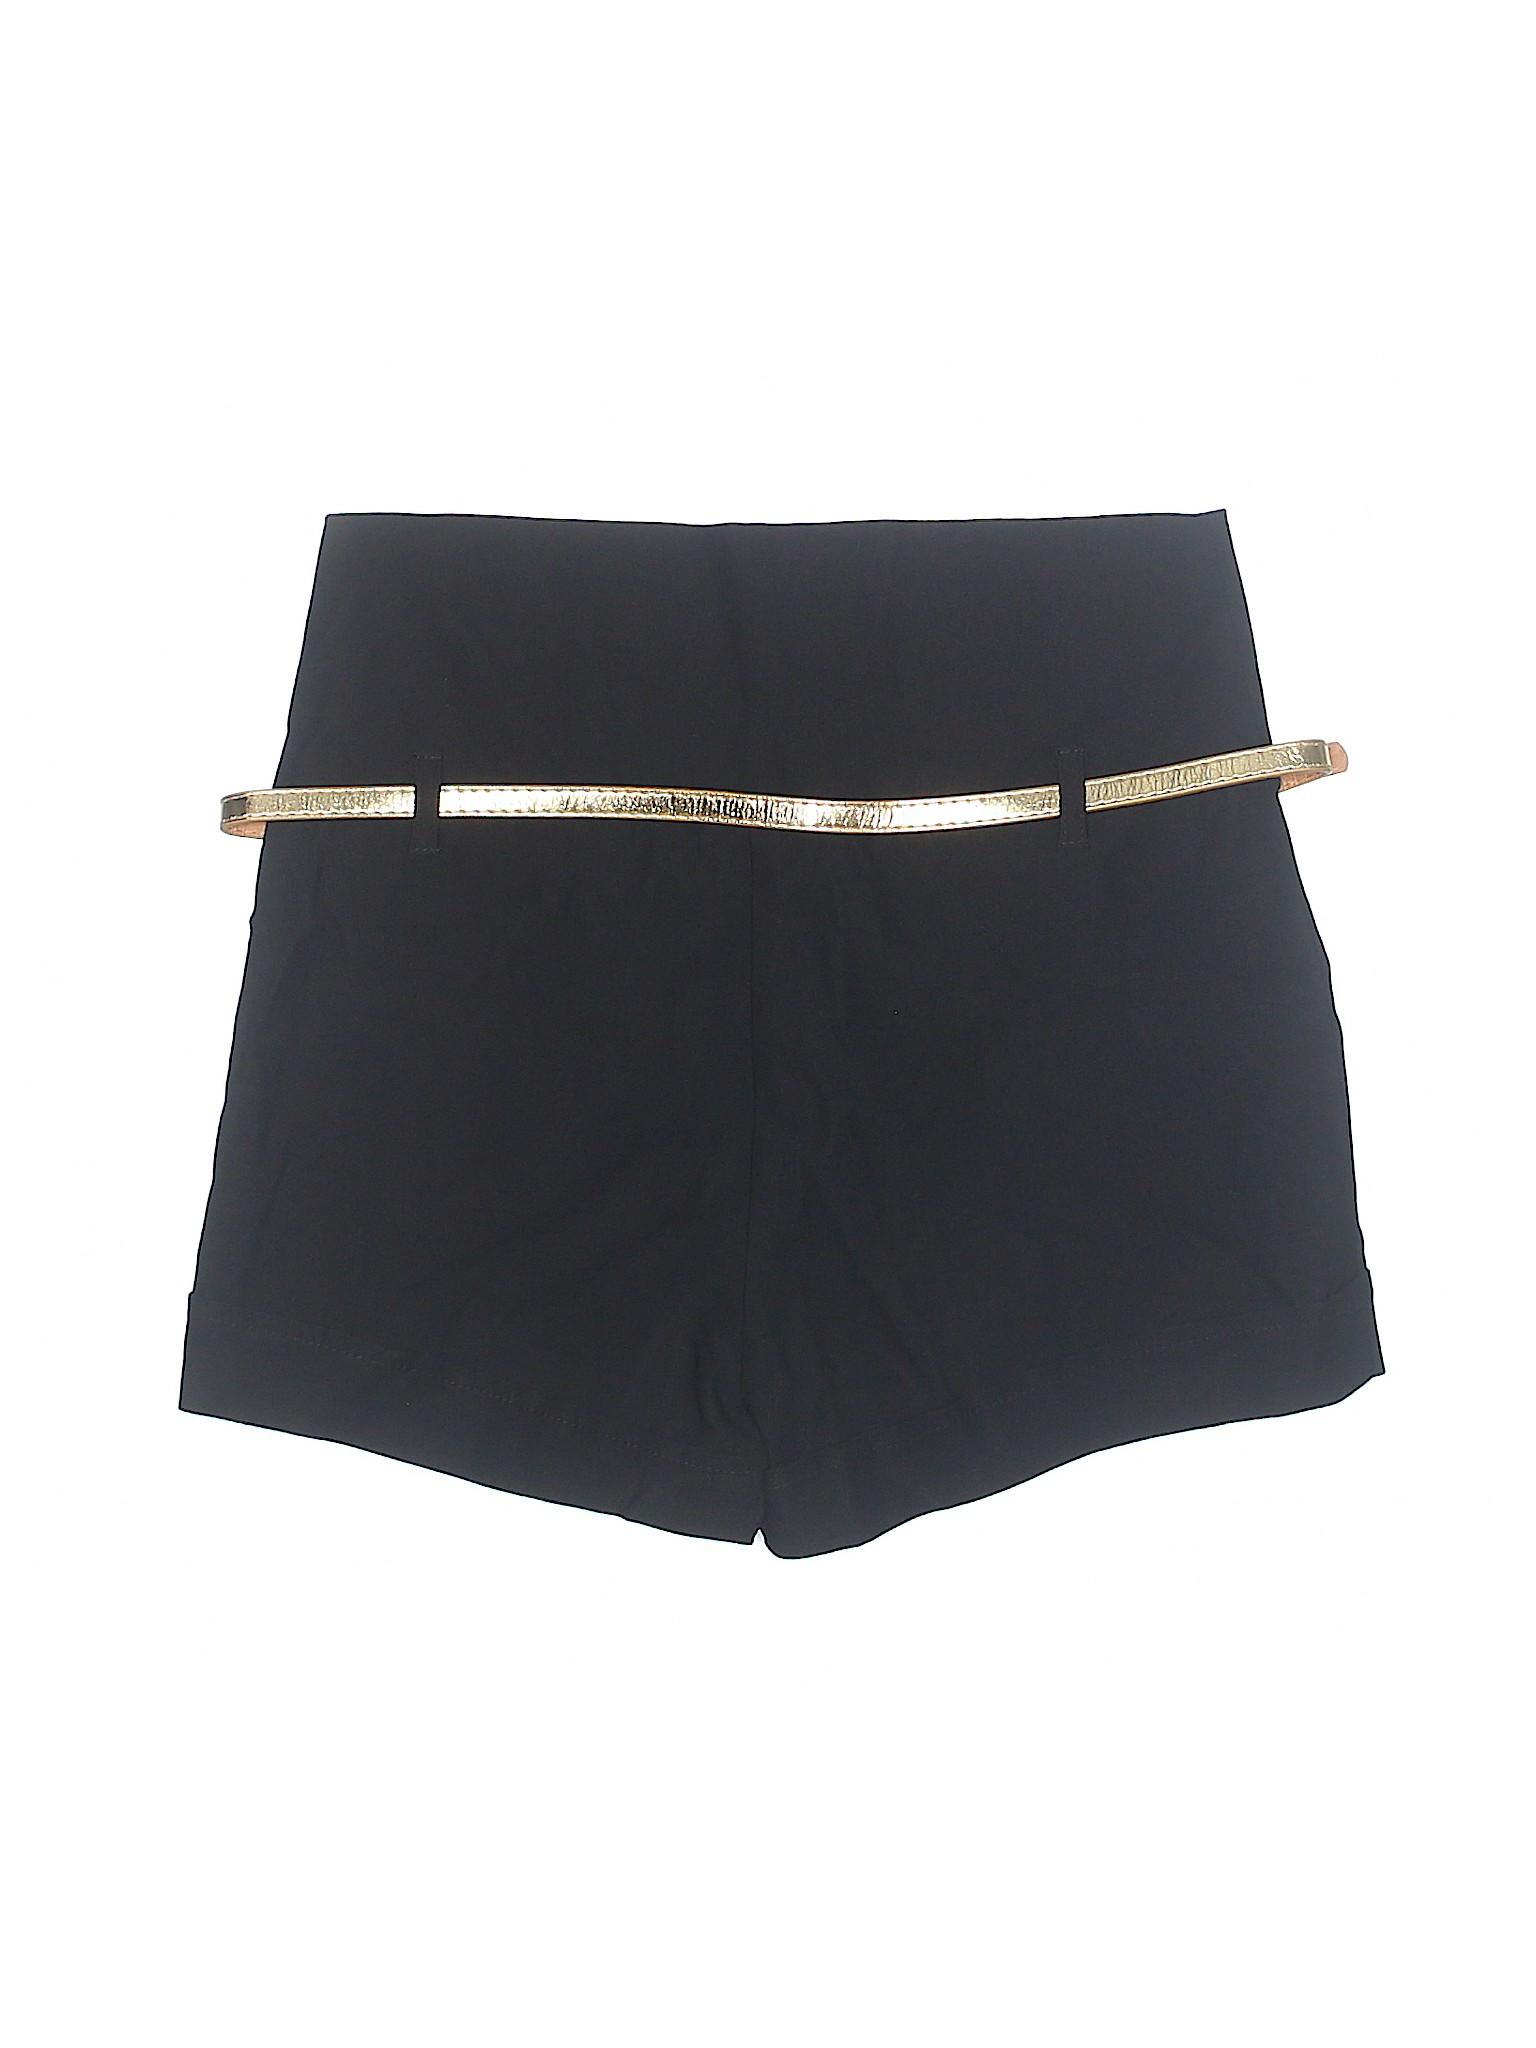 Body Shorts Boutique Shorts Central Body Boutique Central P51pxRqwfx